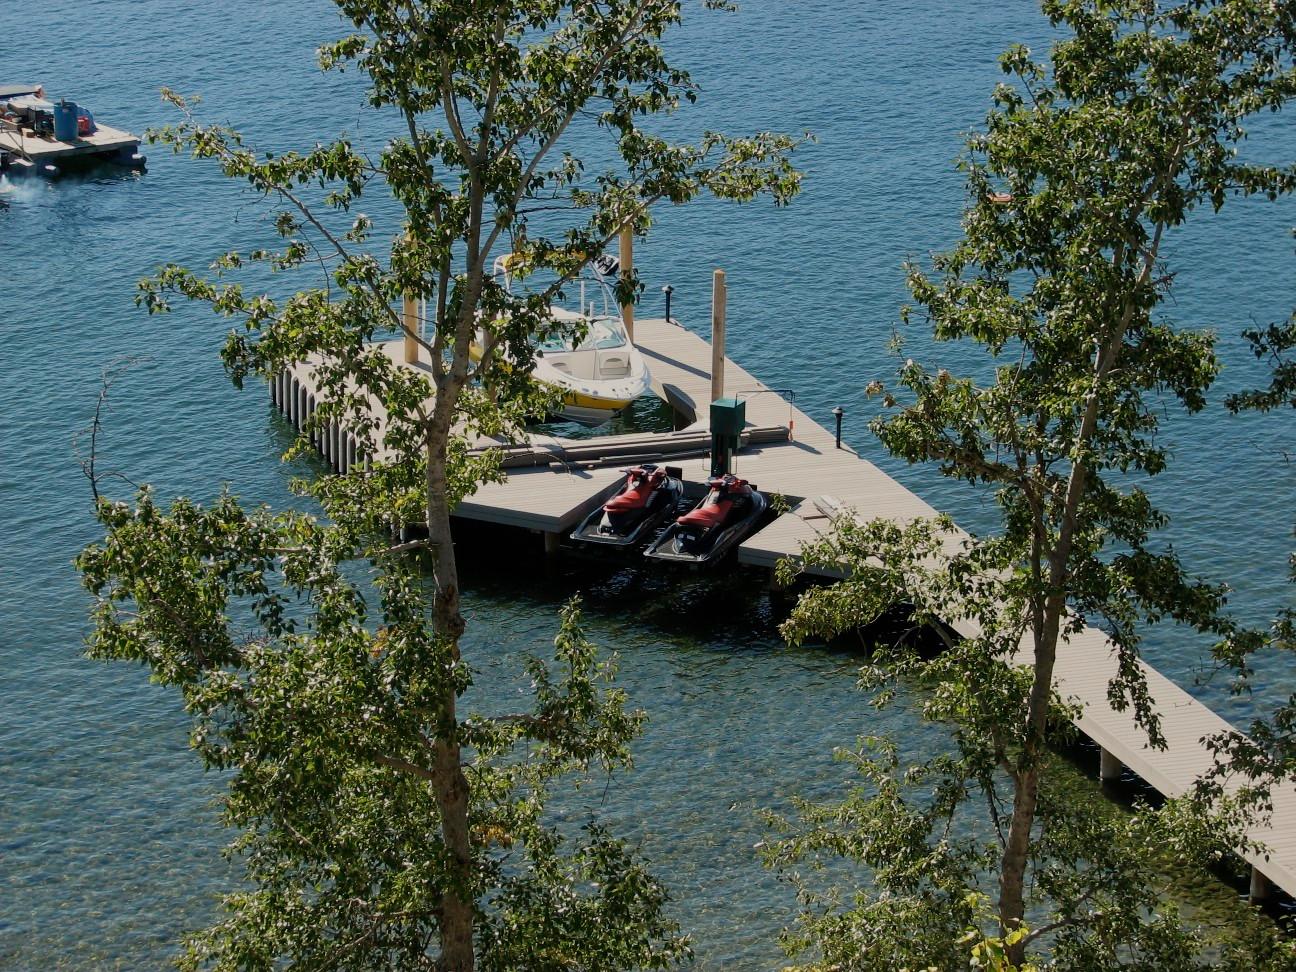 Docks, Decks, and Stairs